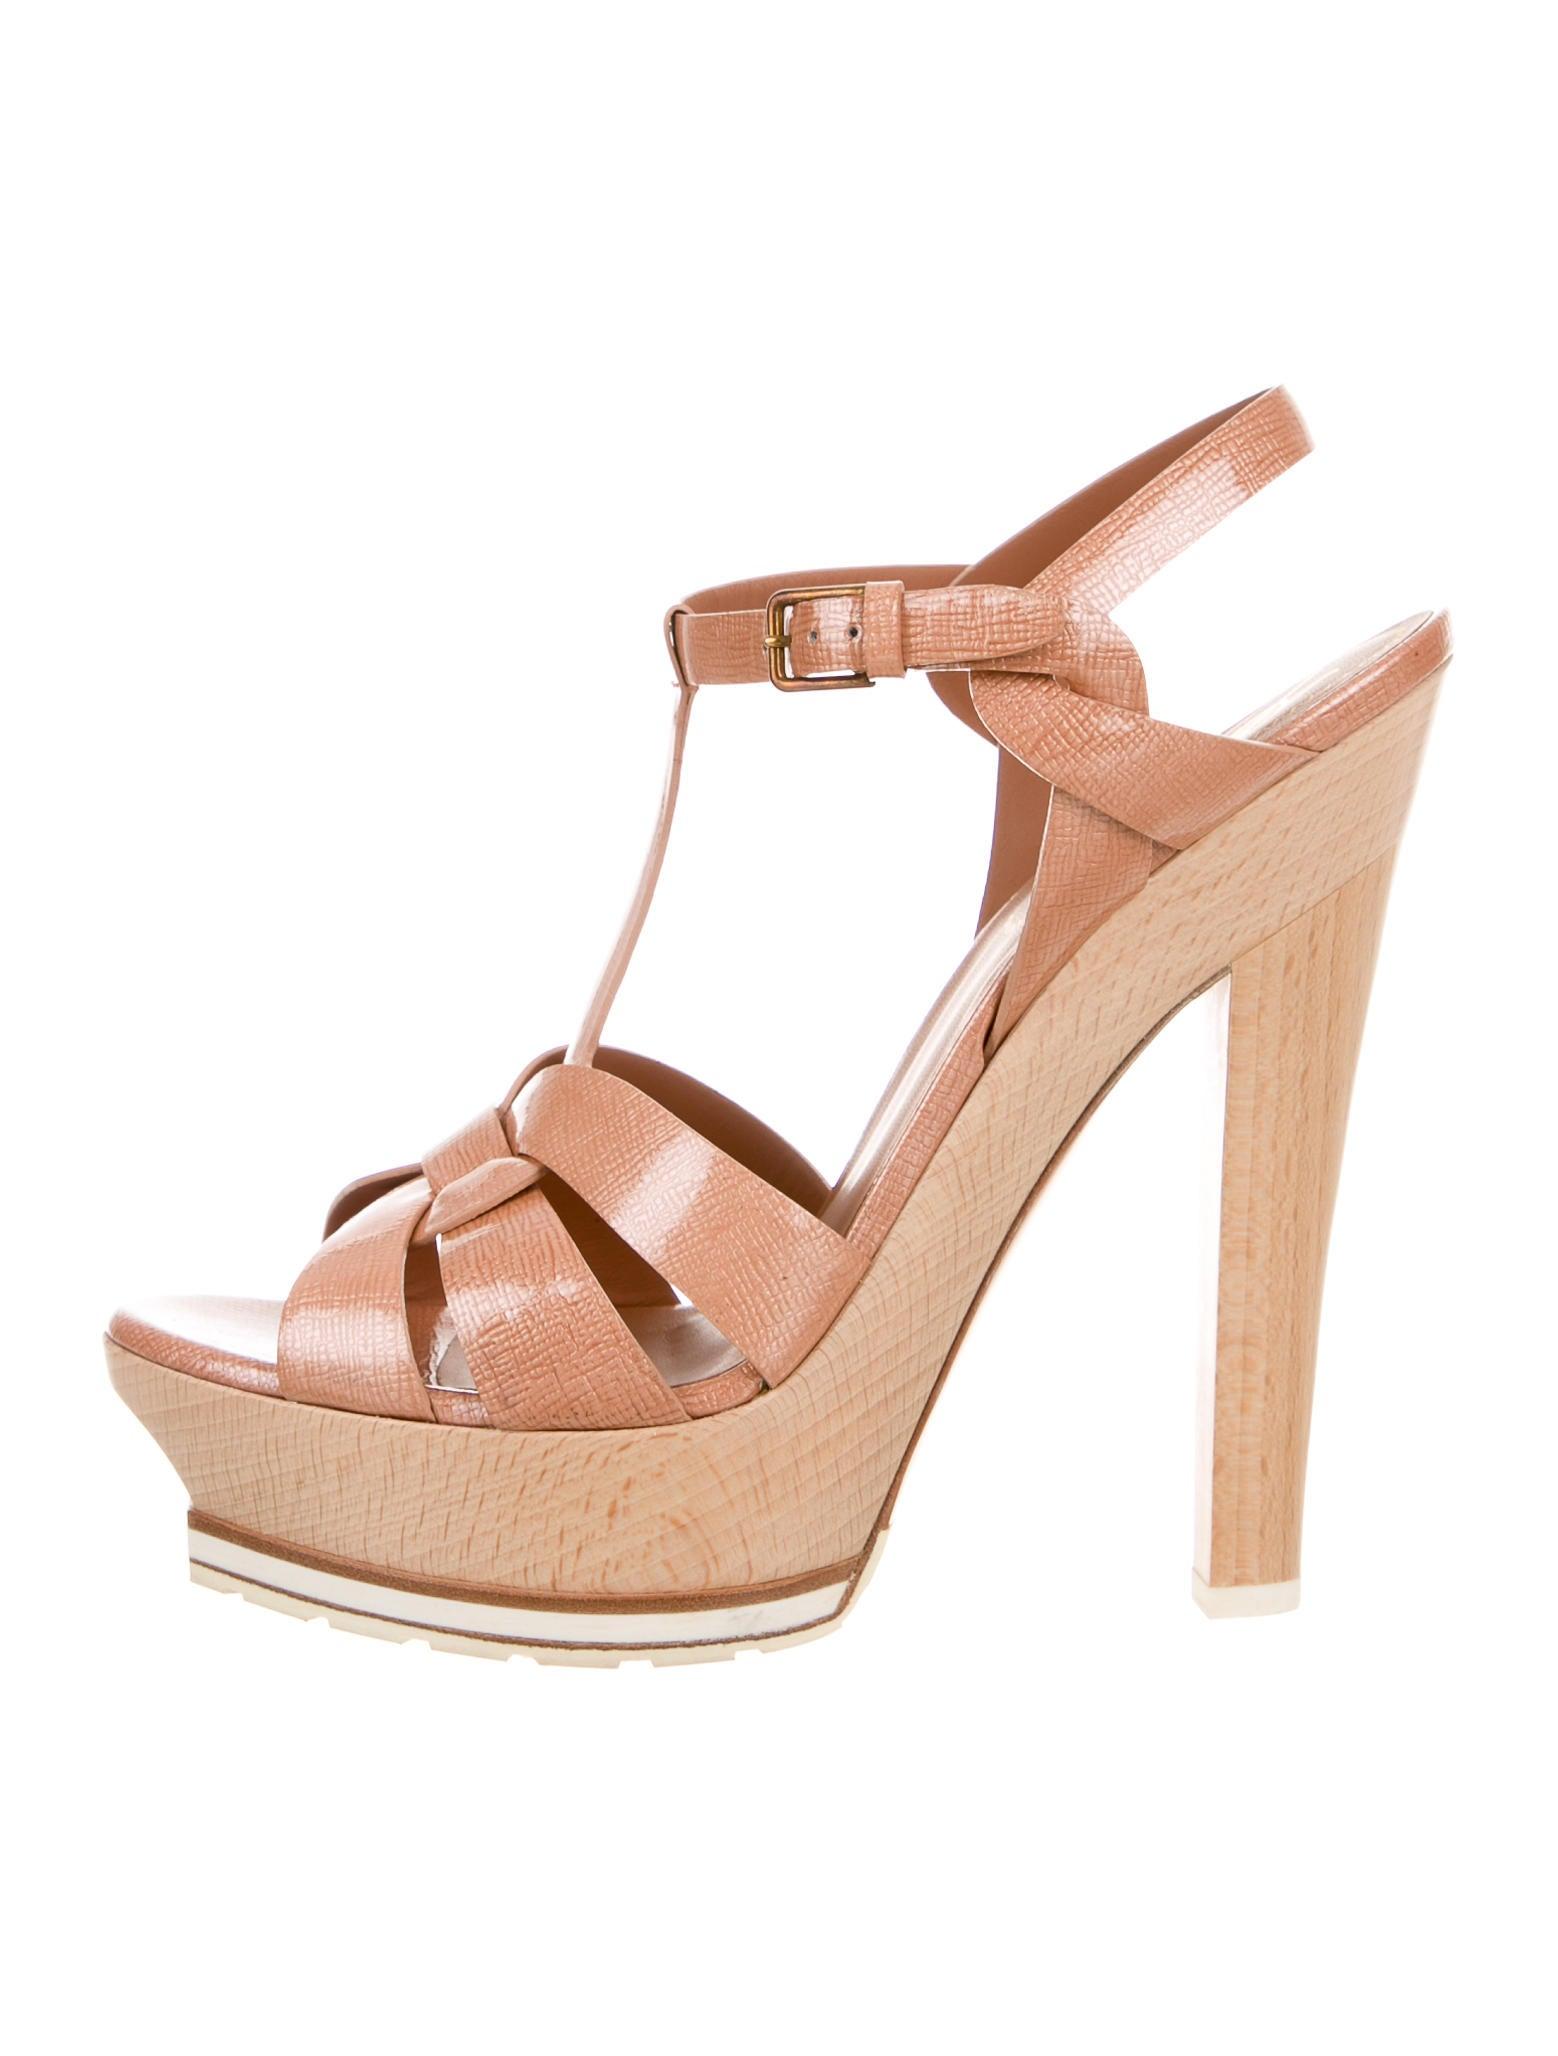 yves saint laurent tribute platform sandals shoes yve59568 the realreal. Black Bedroom Furniture Sets. Home Design Ideas